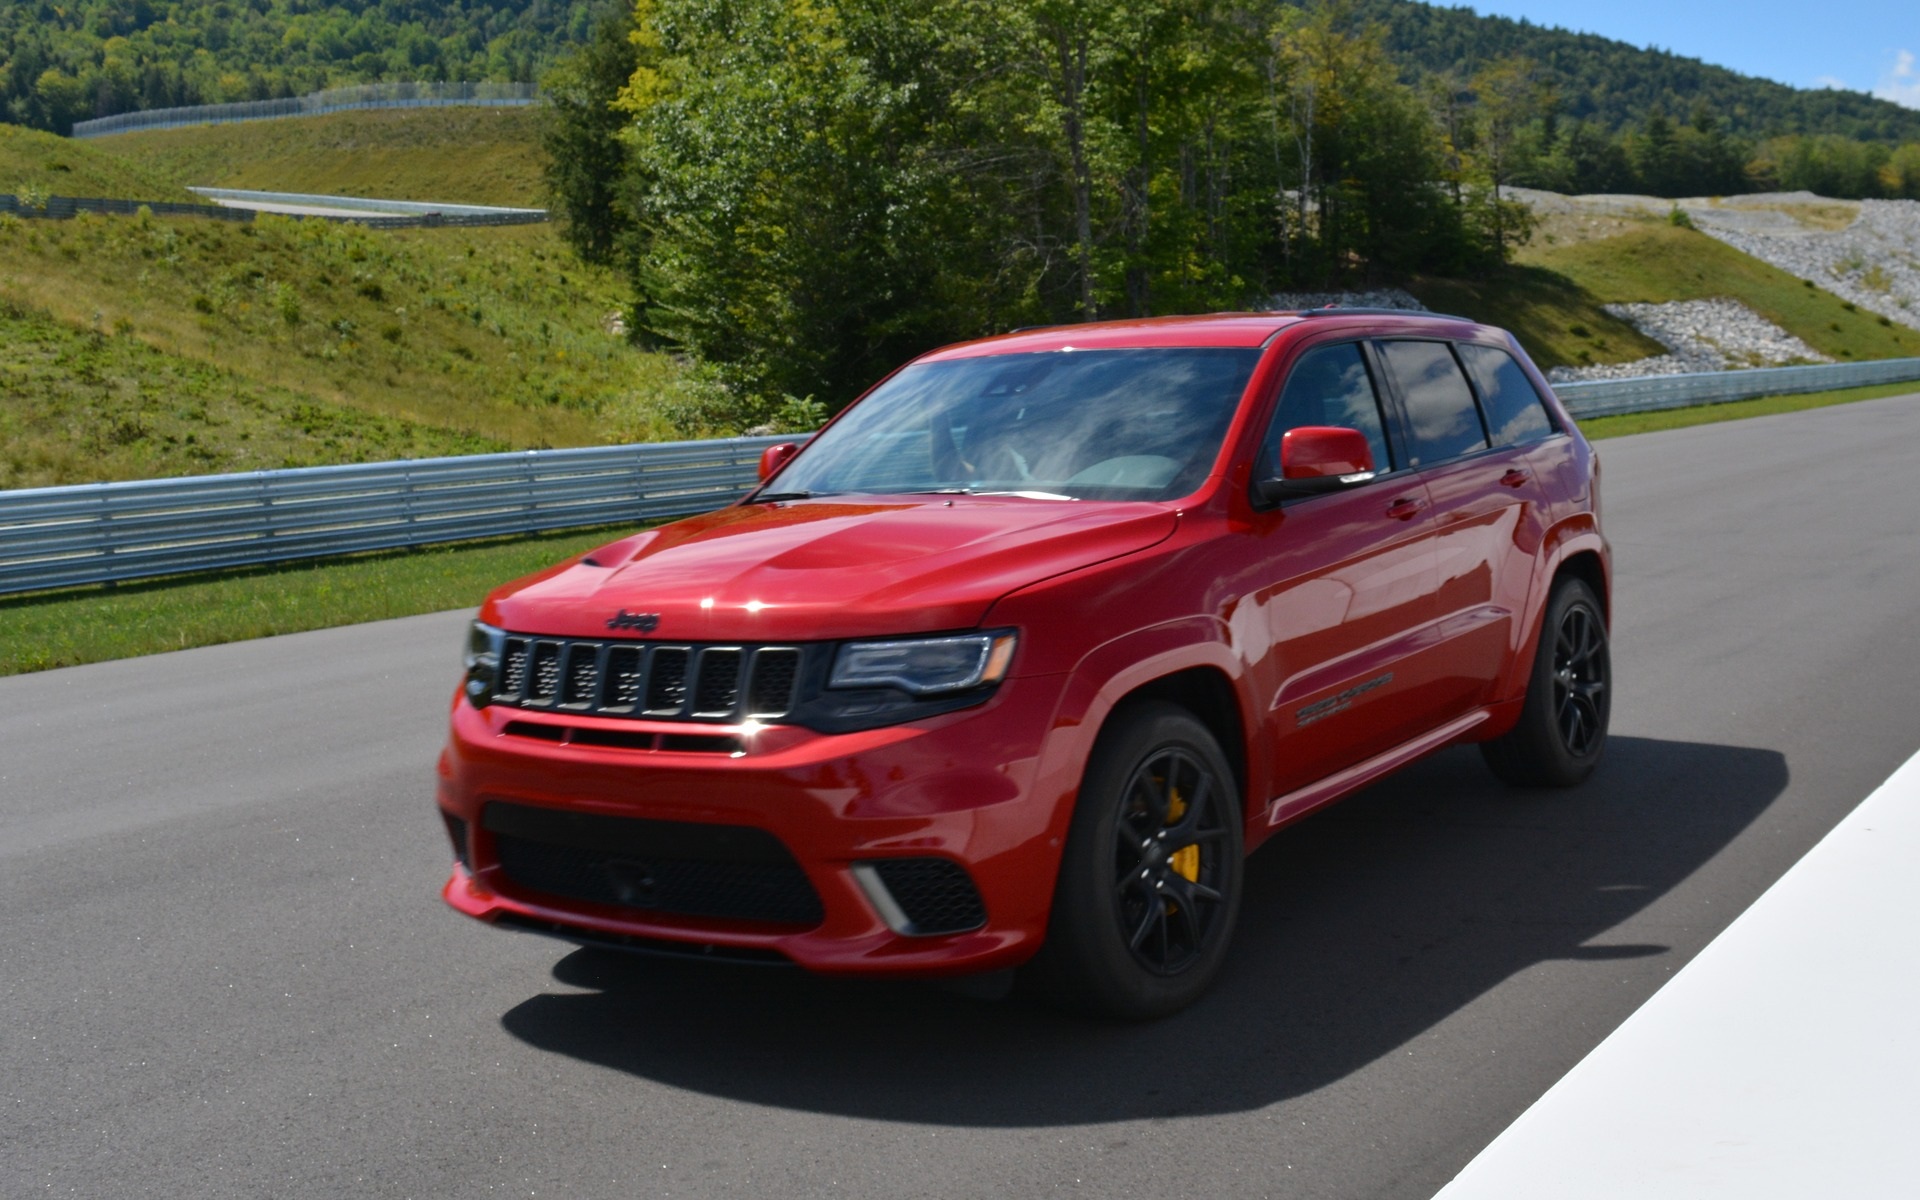 2018 Jeep Grand Cherokee Trackhawk Daily Hellraiser The Car Guide